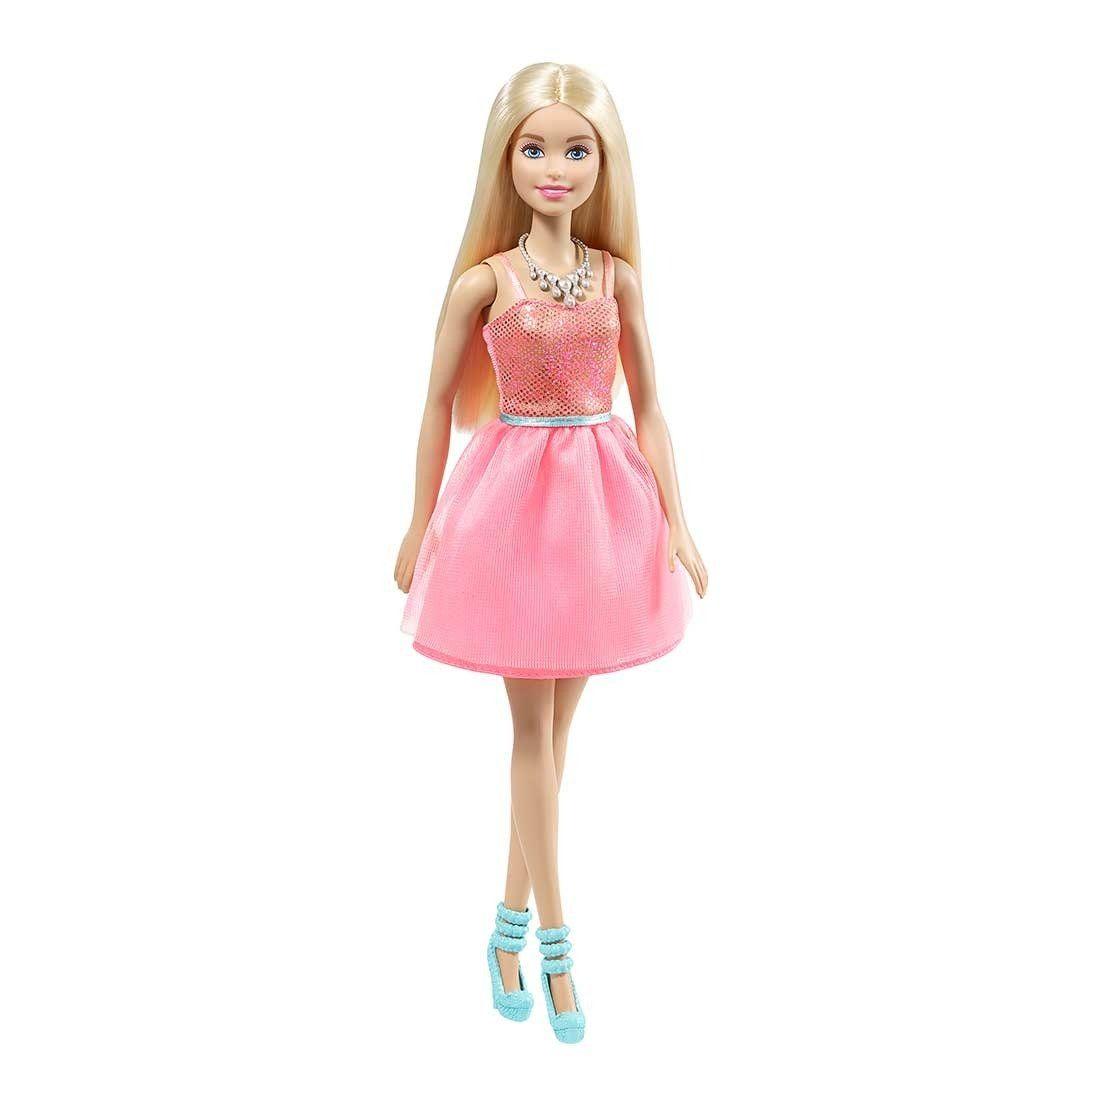 Boneca Barbie - Mattel